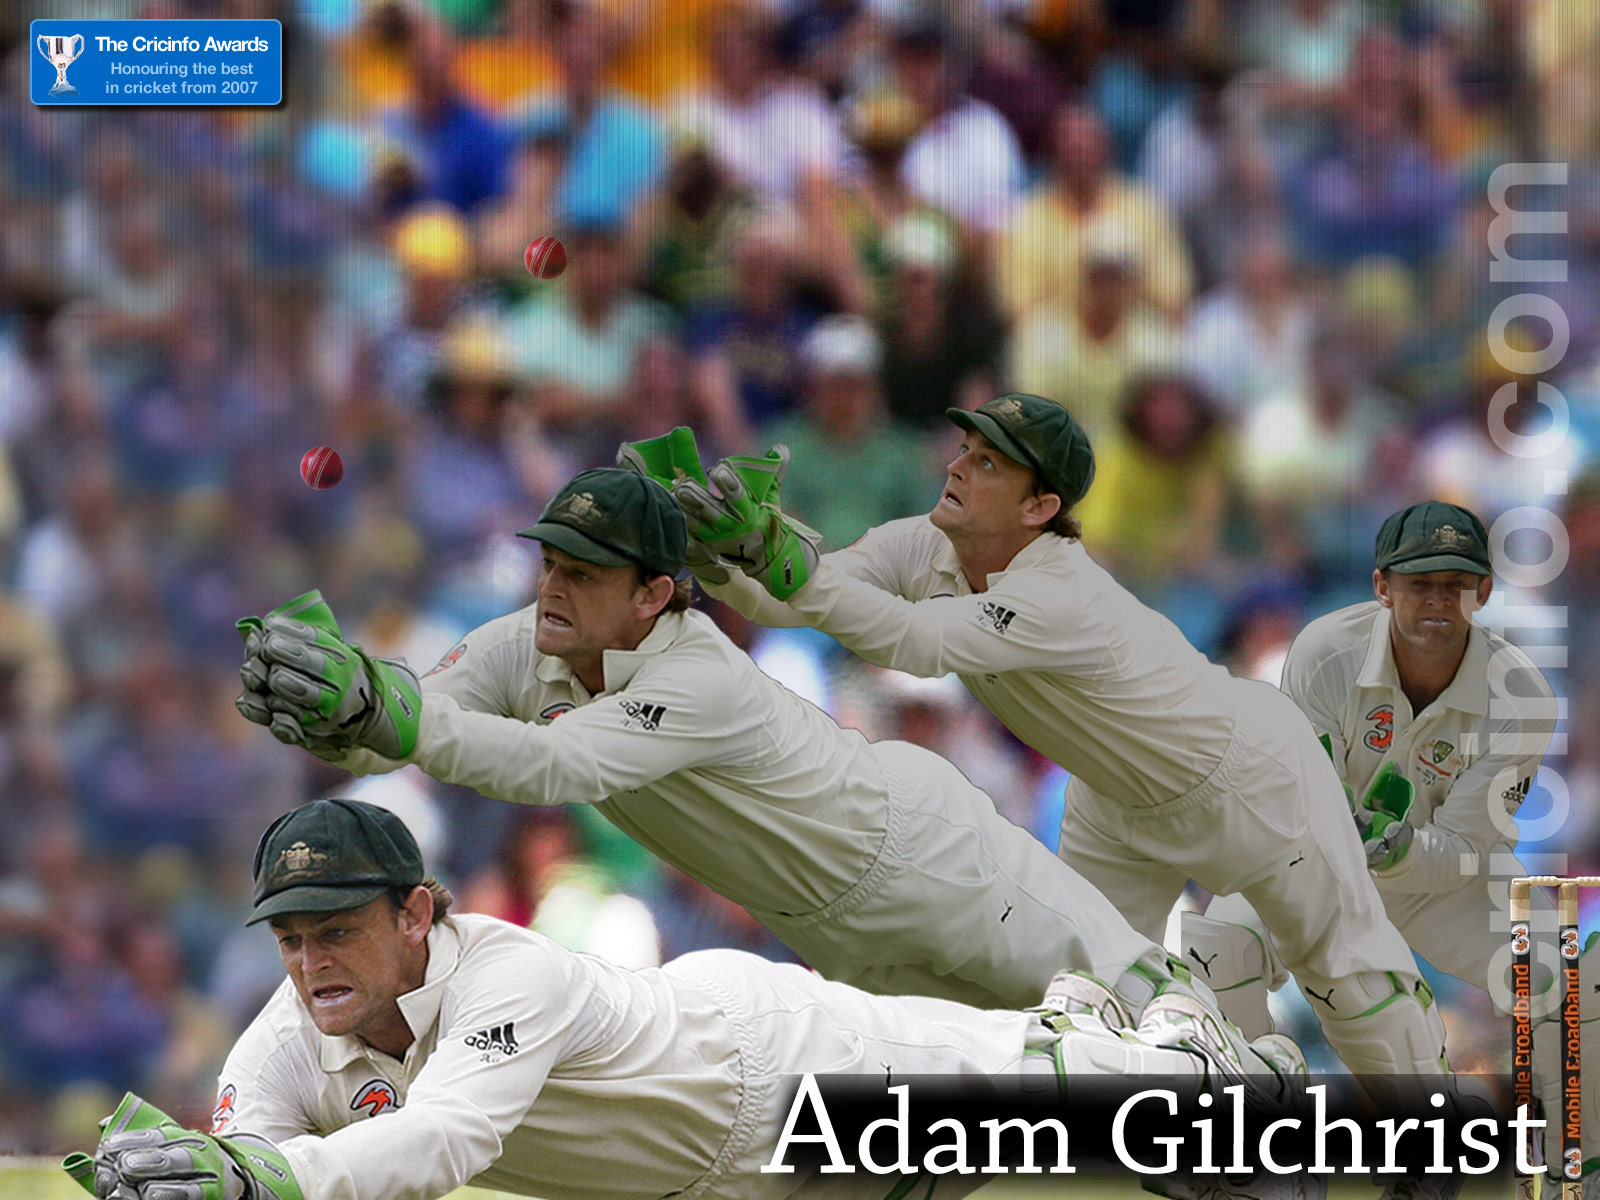 Adam Gilchrist, winner ODI batting